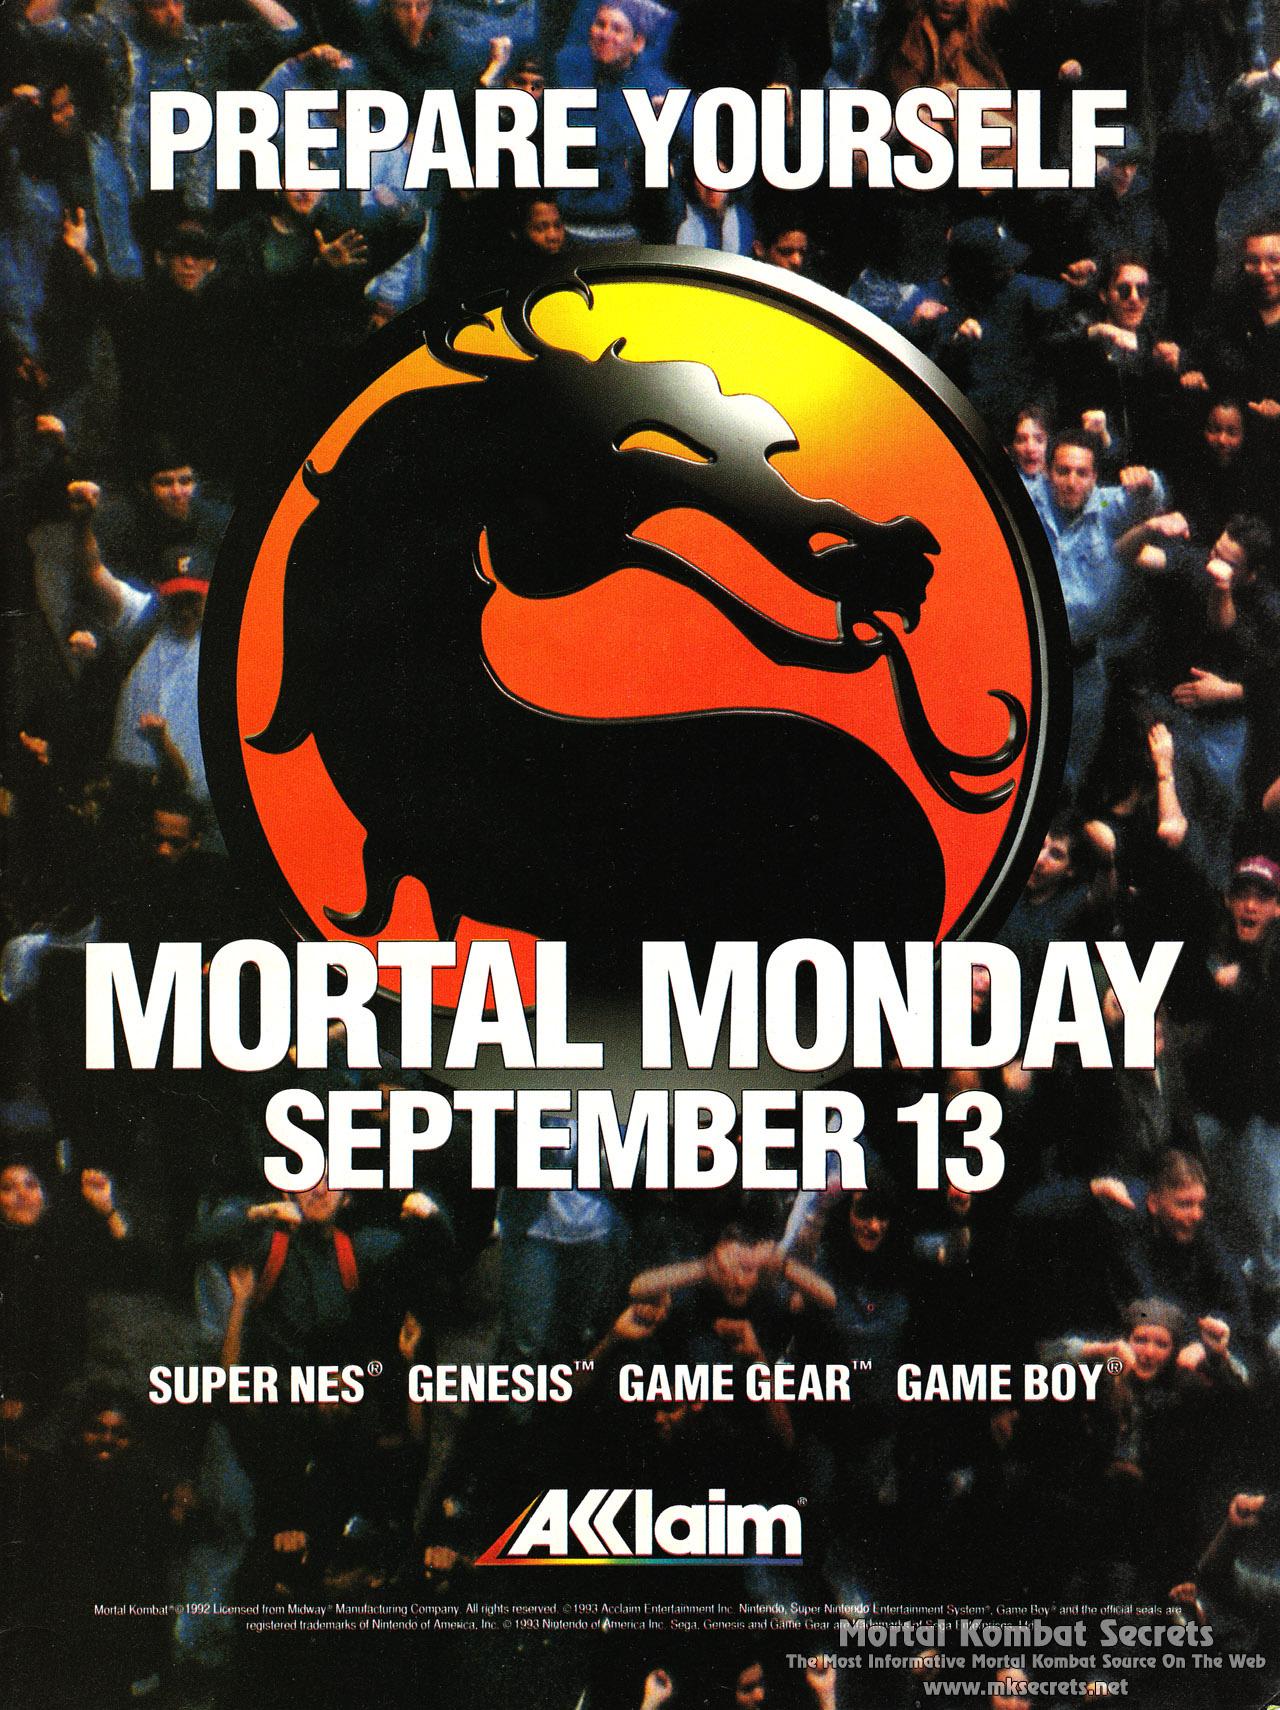 Mortal Kombat 1 1992 Advertisements Mortal Kombat Secrets